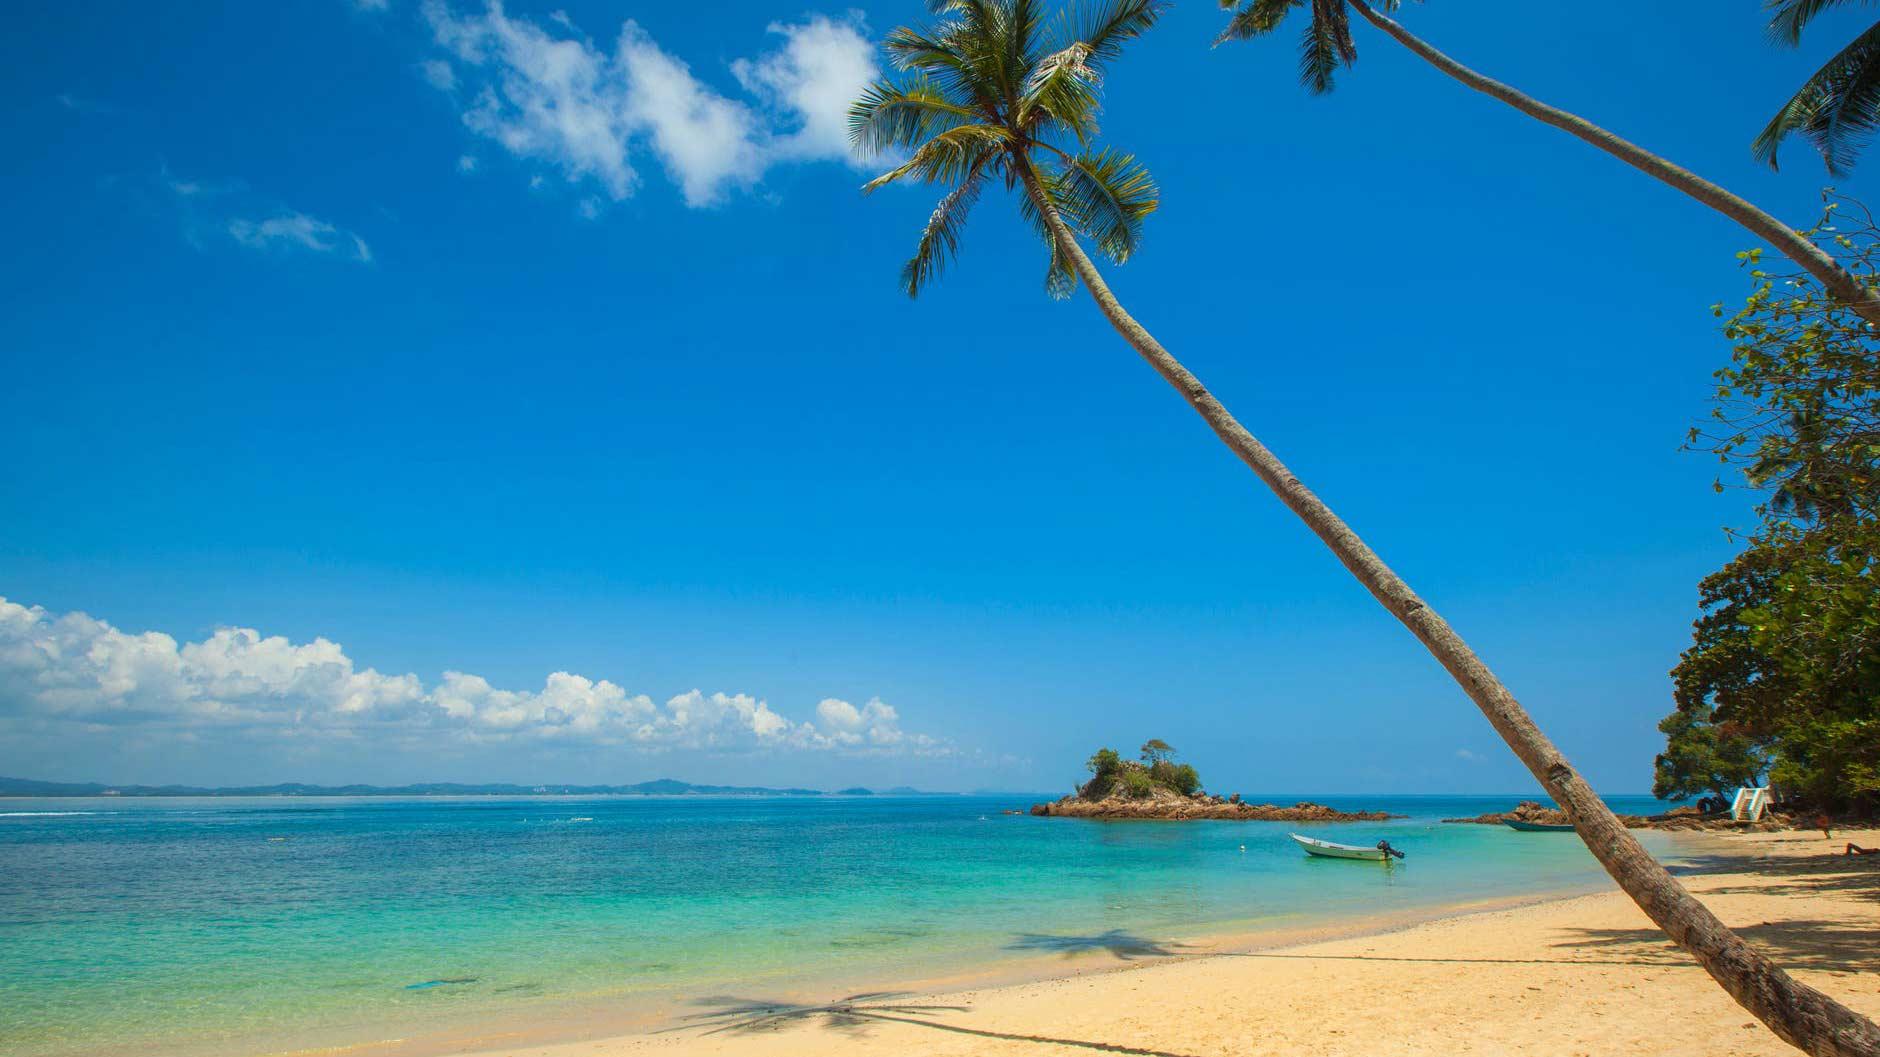 Vieques, Puerto Rico